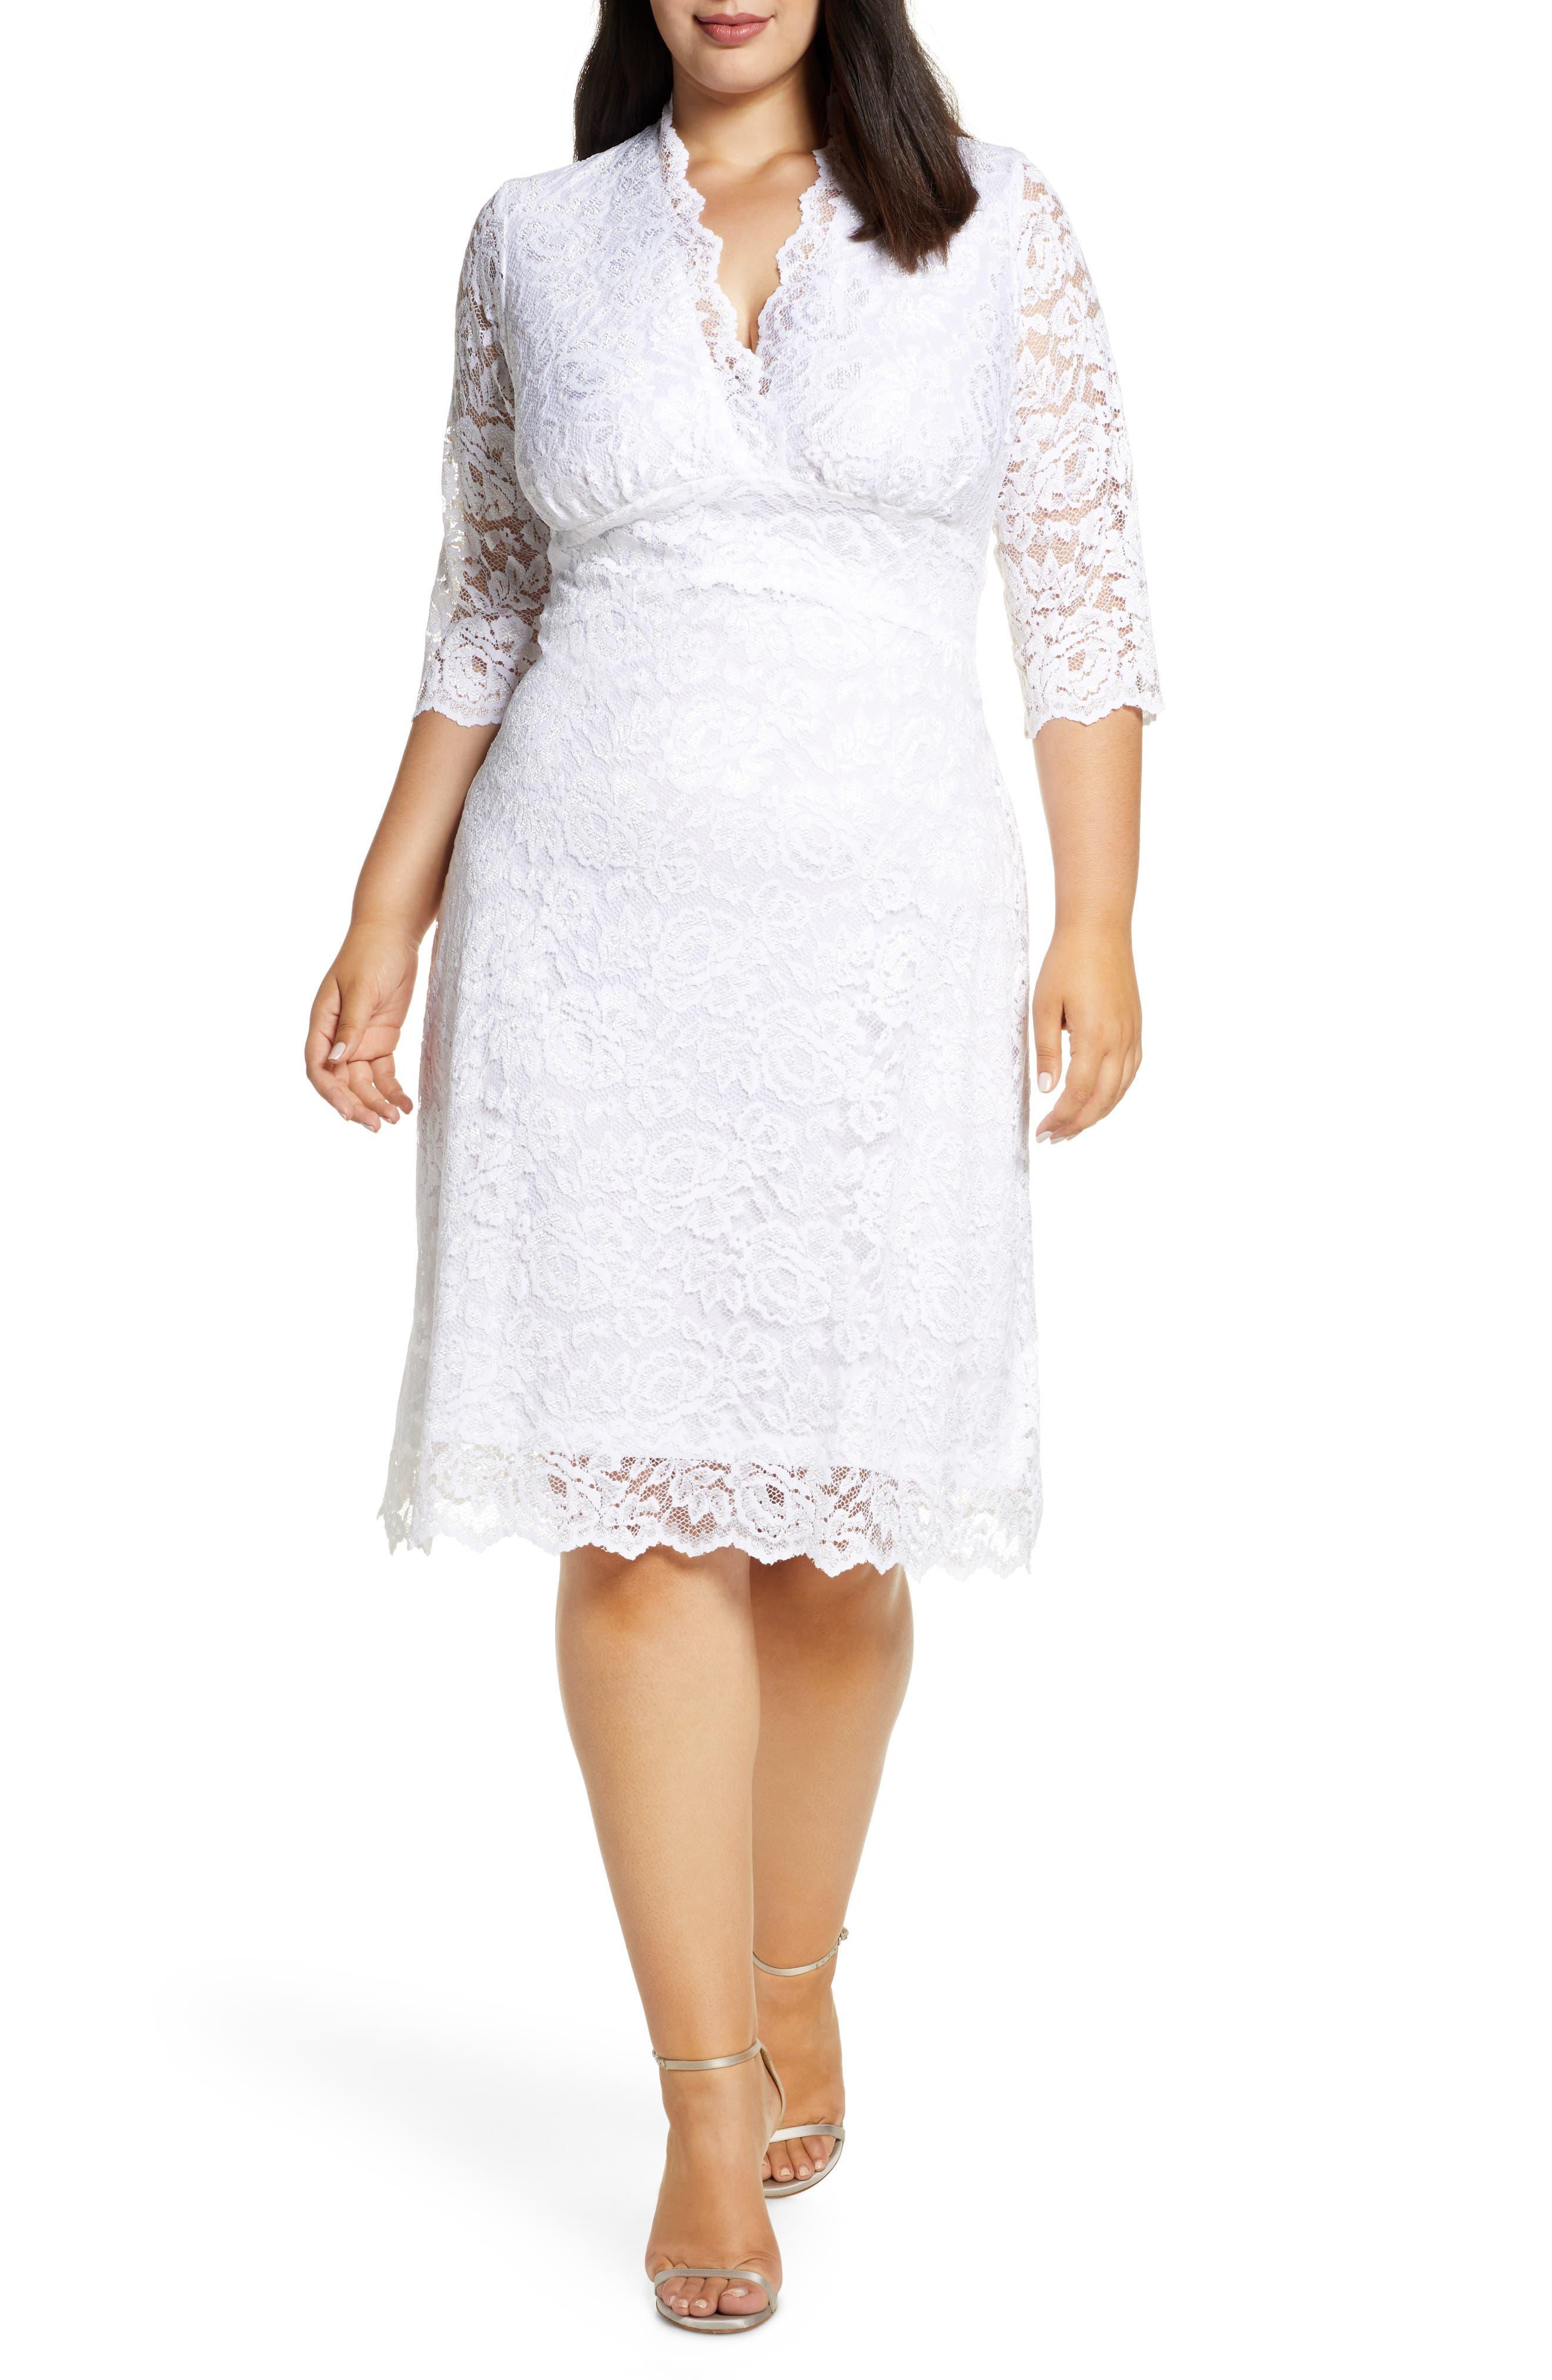 60s Wedding Dresses | 70s Wedding Dresses Plus Size Womens Kiyonna Lace Cocktail Dress $174.40 AT vintagedancer.com